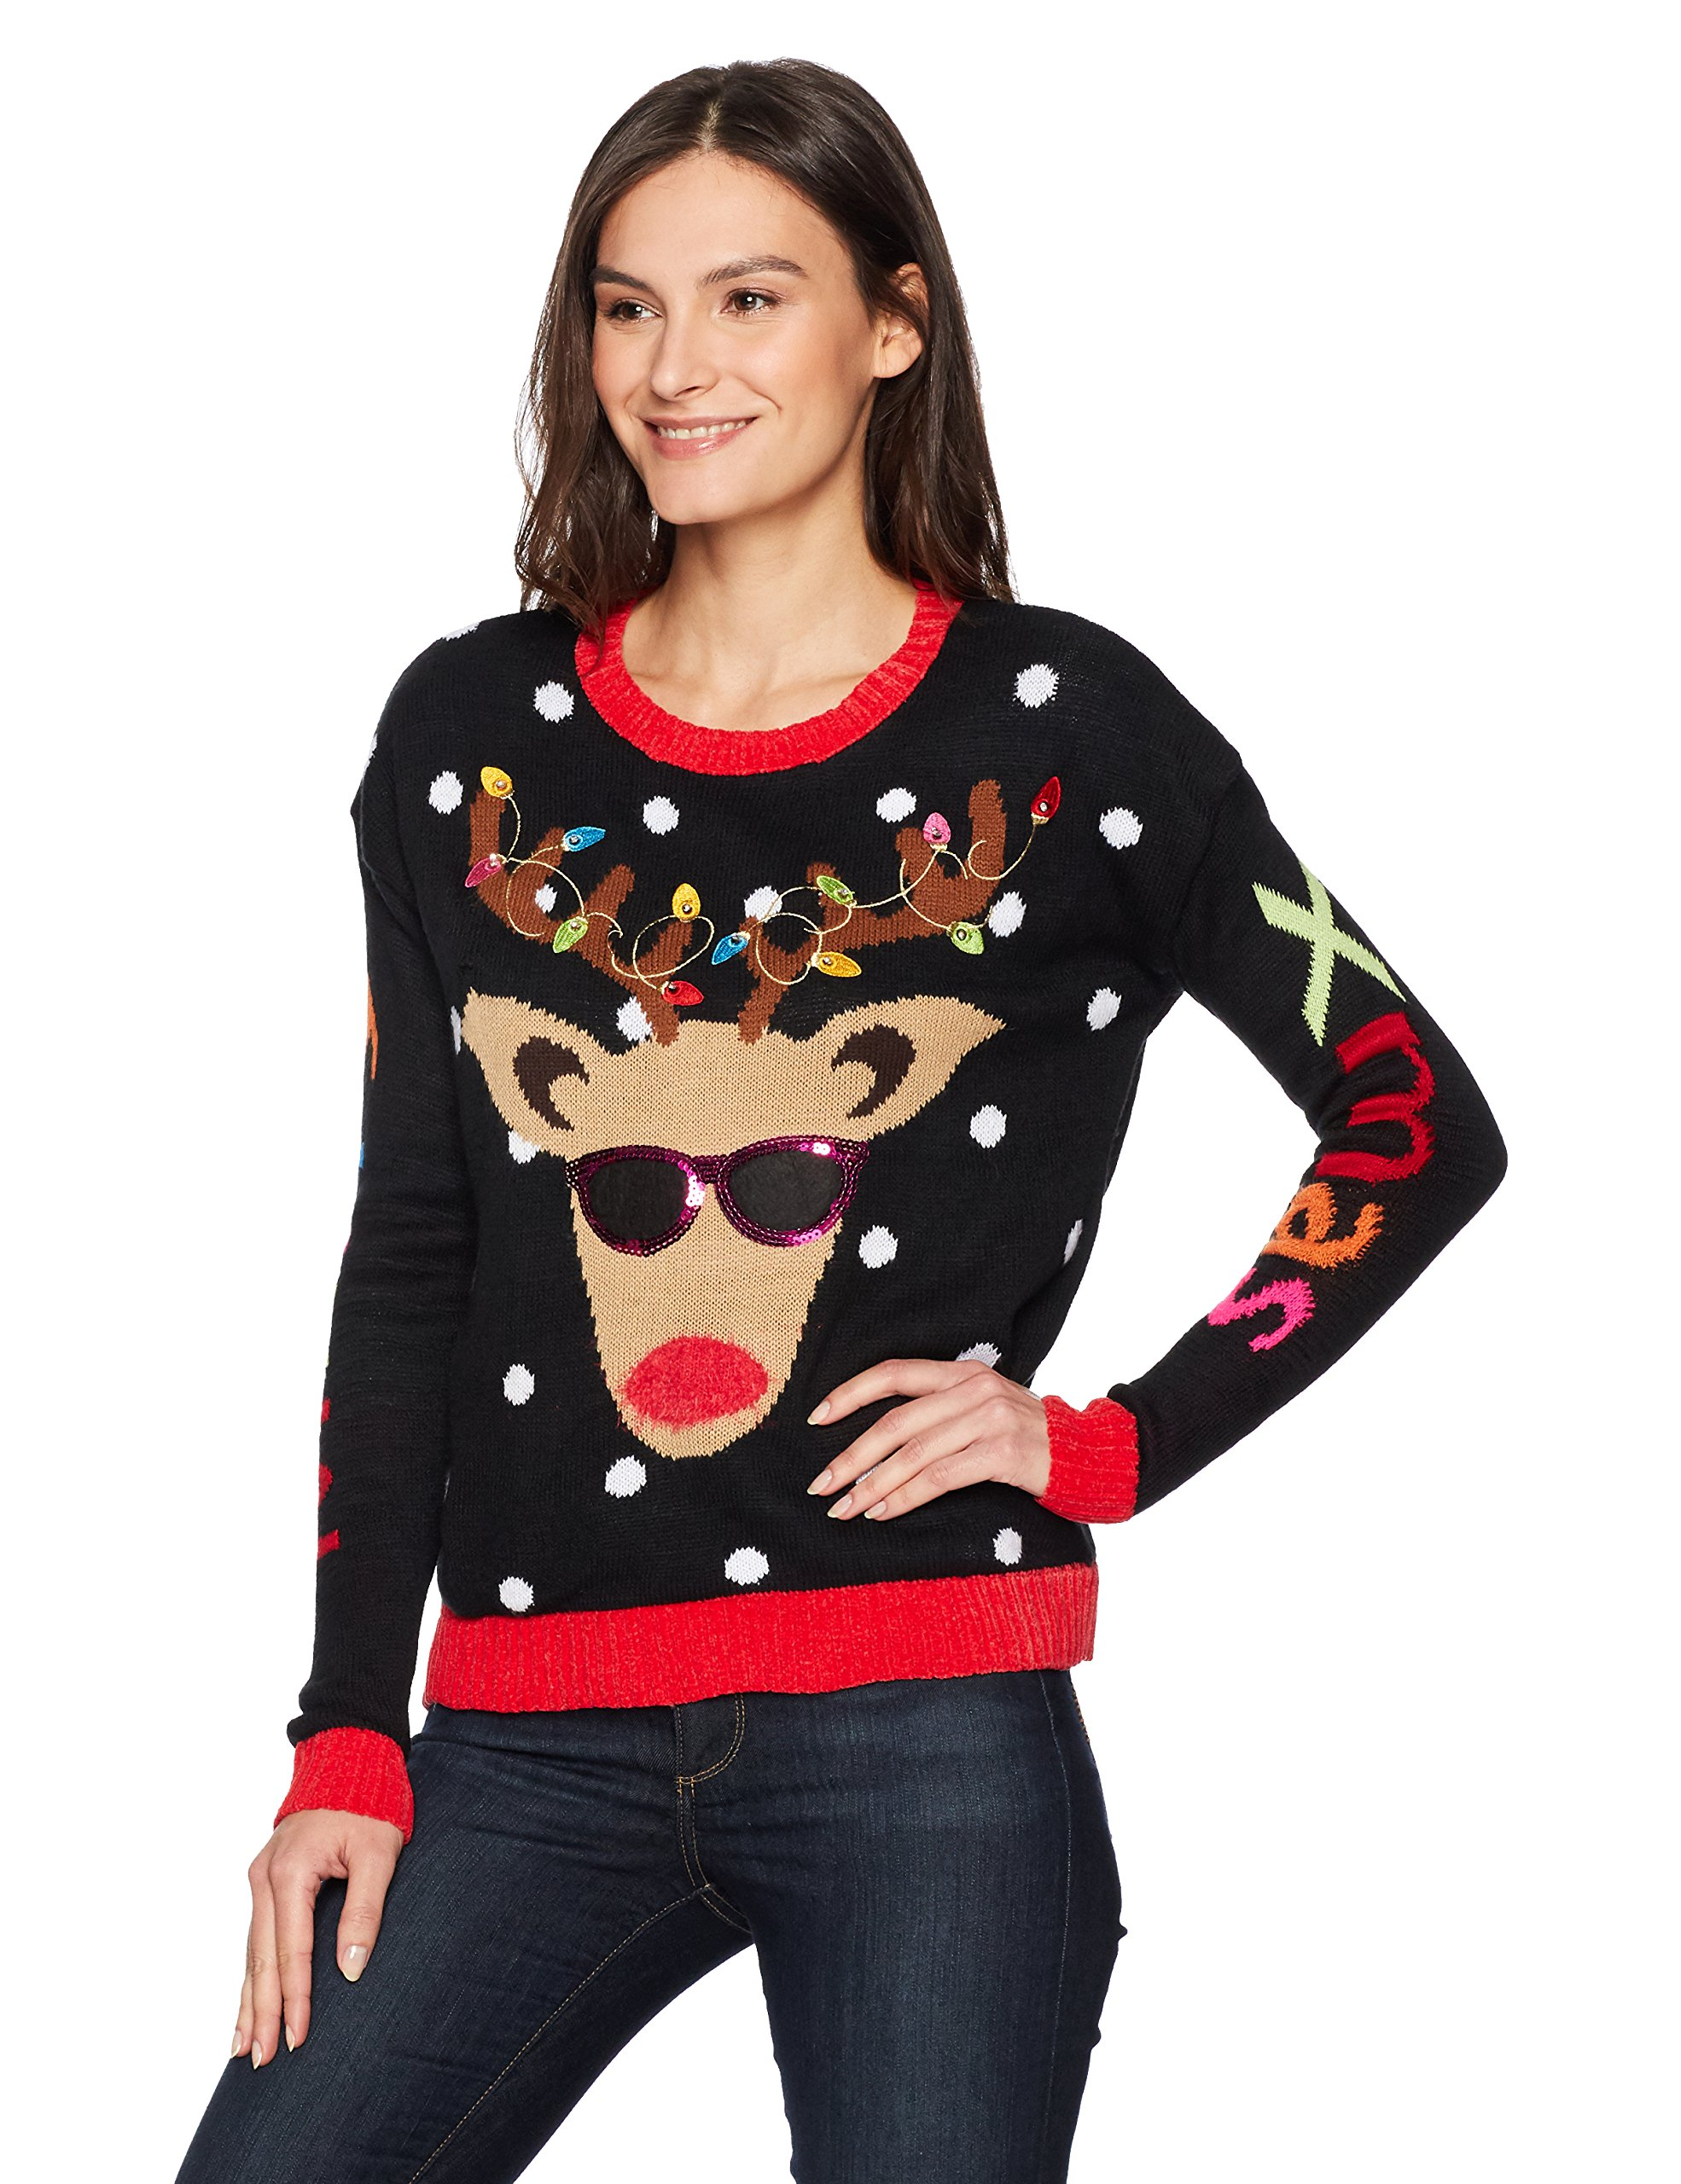 Blizzard Bay Women's Light up Reindeer L/s Crew Neck Pullover, Black, XL